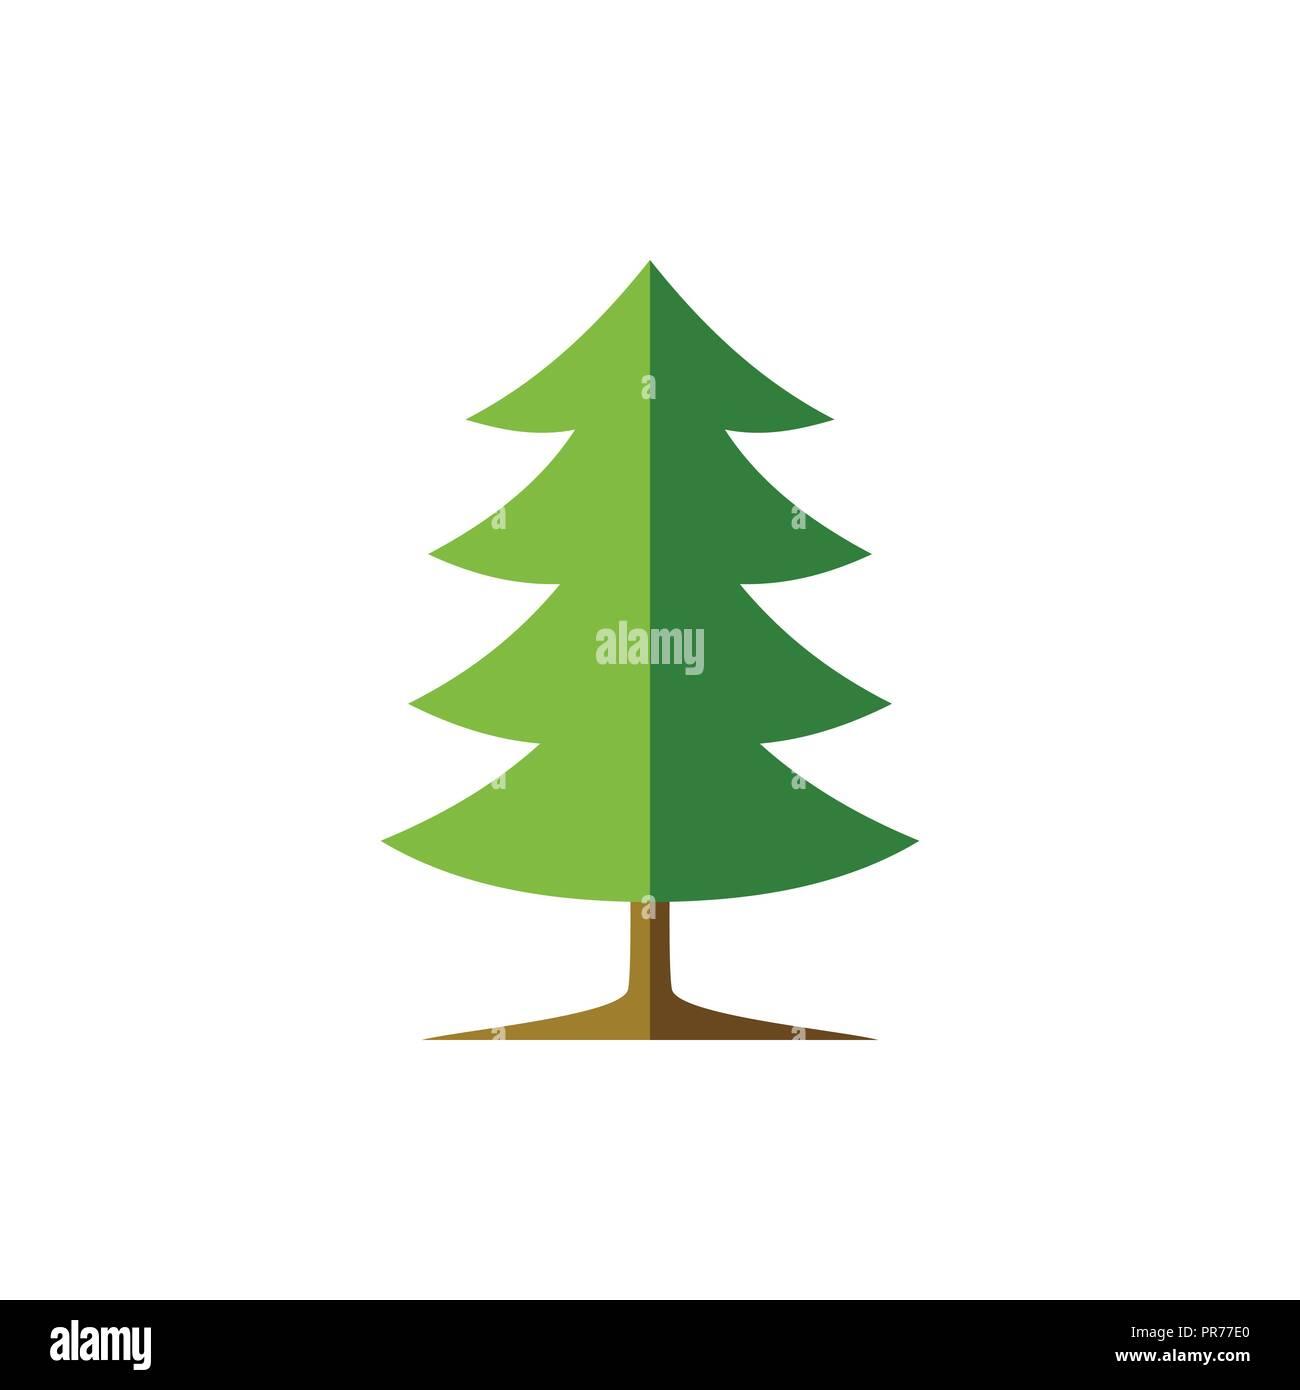 Simple Spruce Tree Illustration Vector Symbol Graphic Logo Design Template - Stock Vector